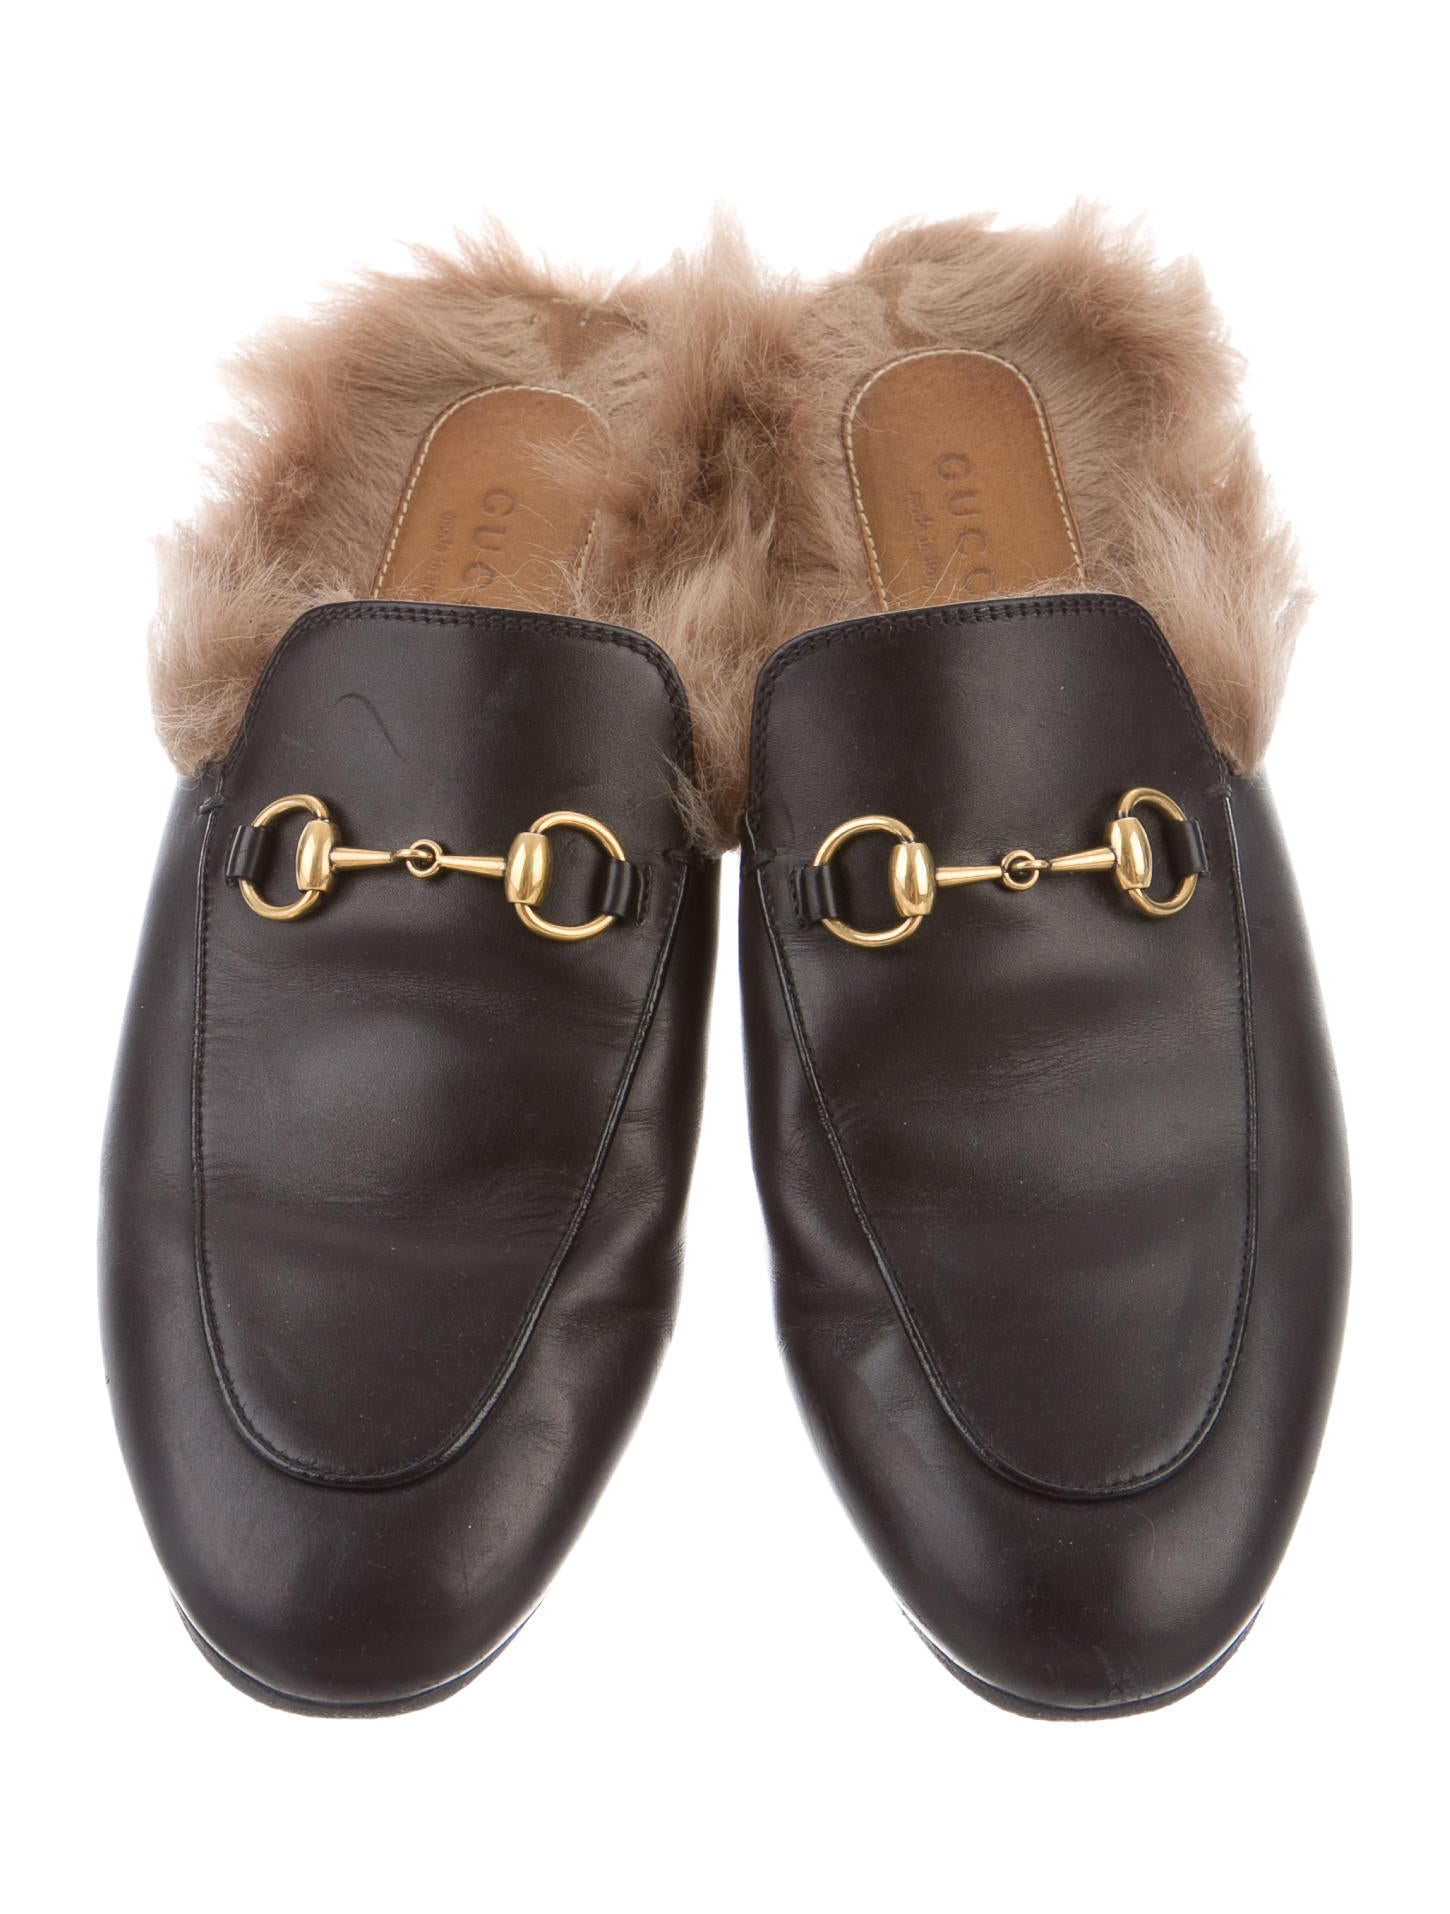 05e33b02dc1631 Gucci 2017 Princetown Fur-Lined Mules - Shoes - GUC134910